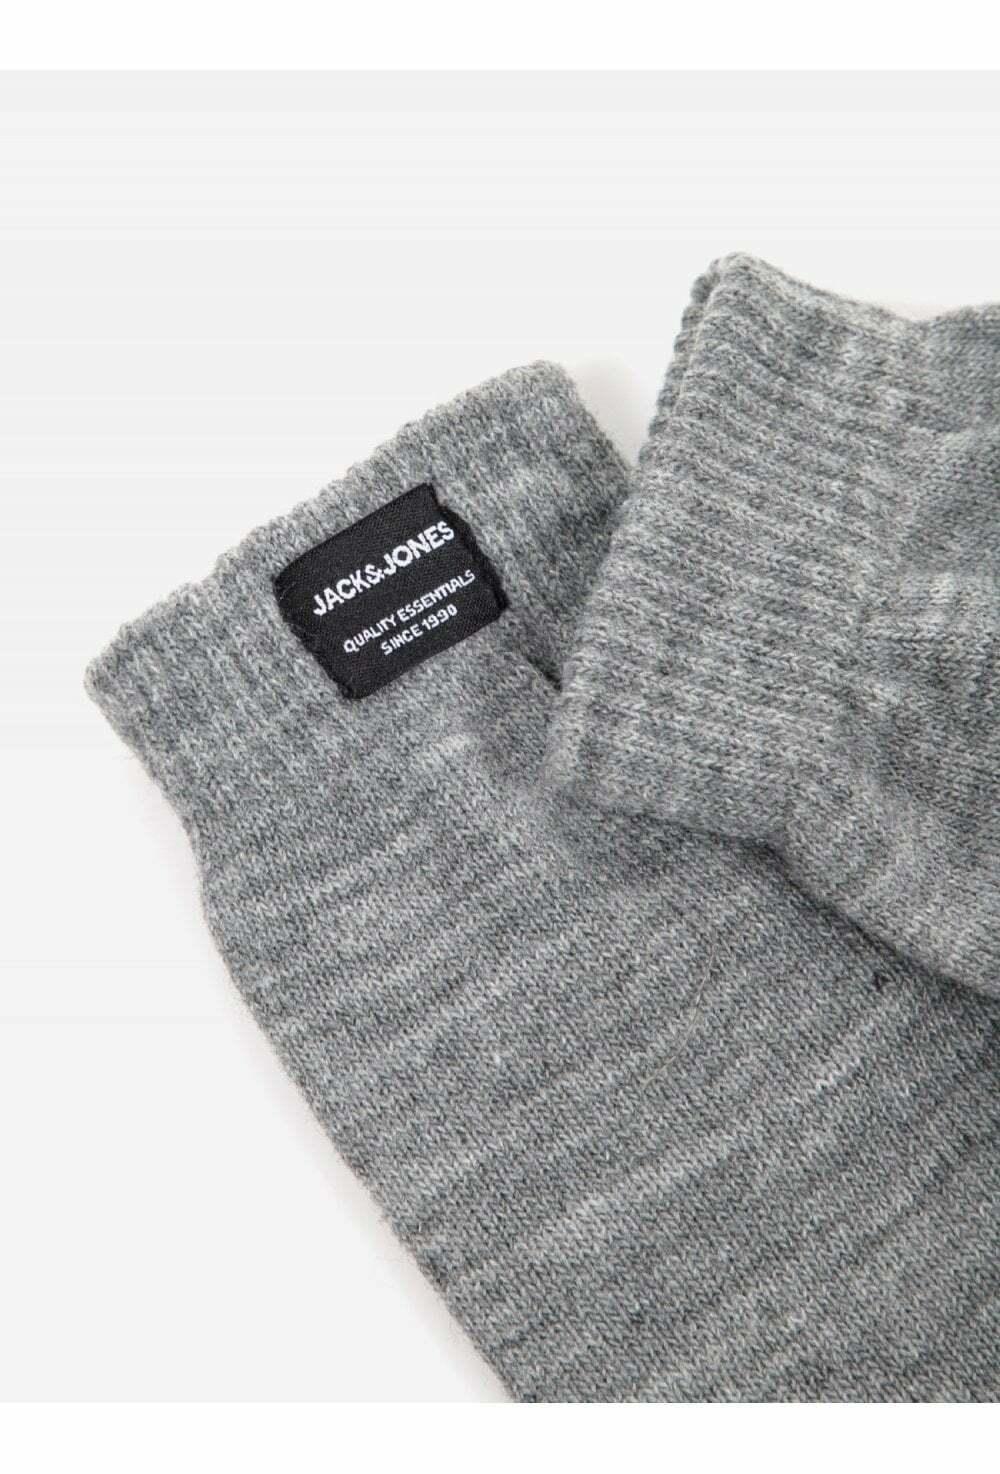 Jack And Jones Jachenry Knit Gloves Grey Melange